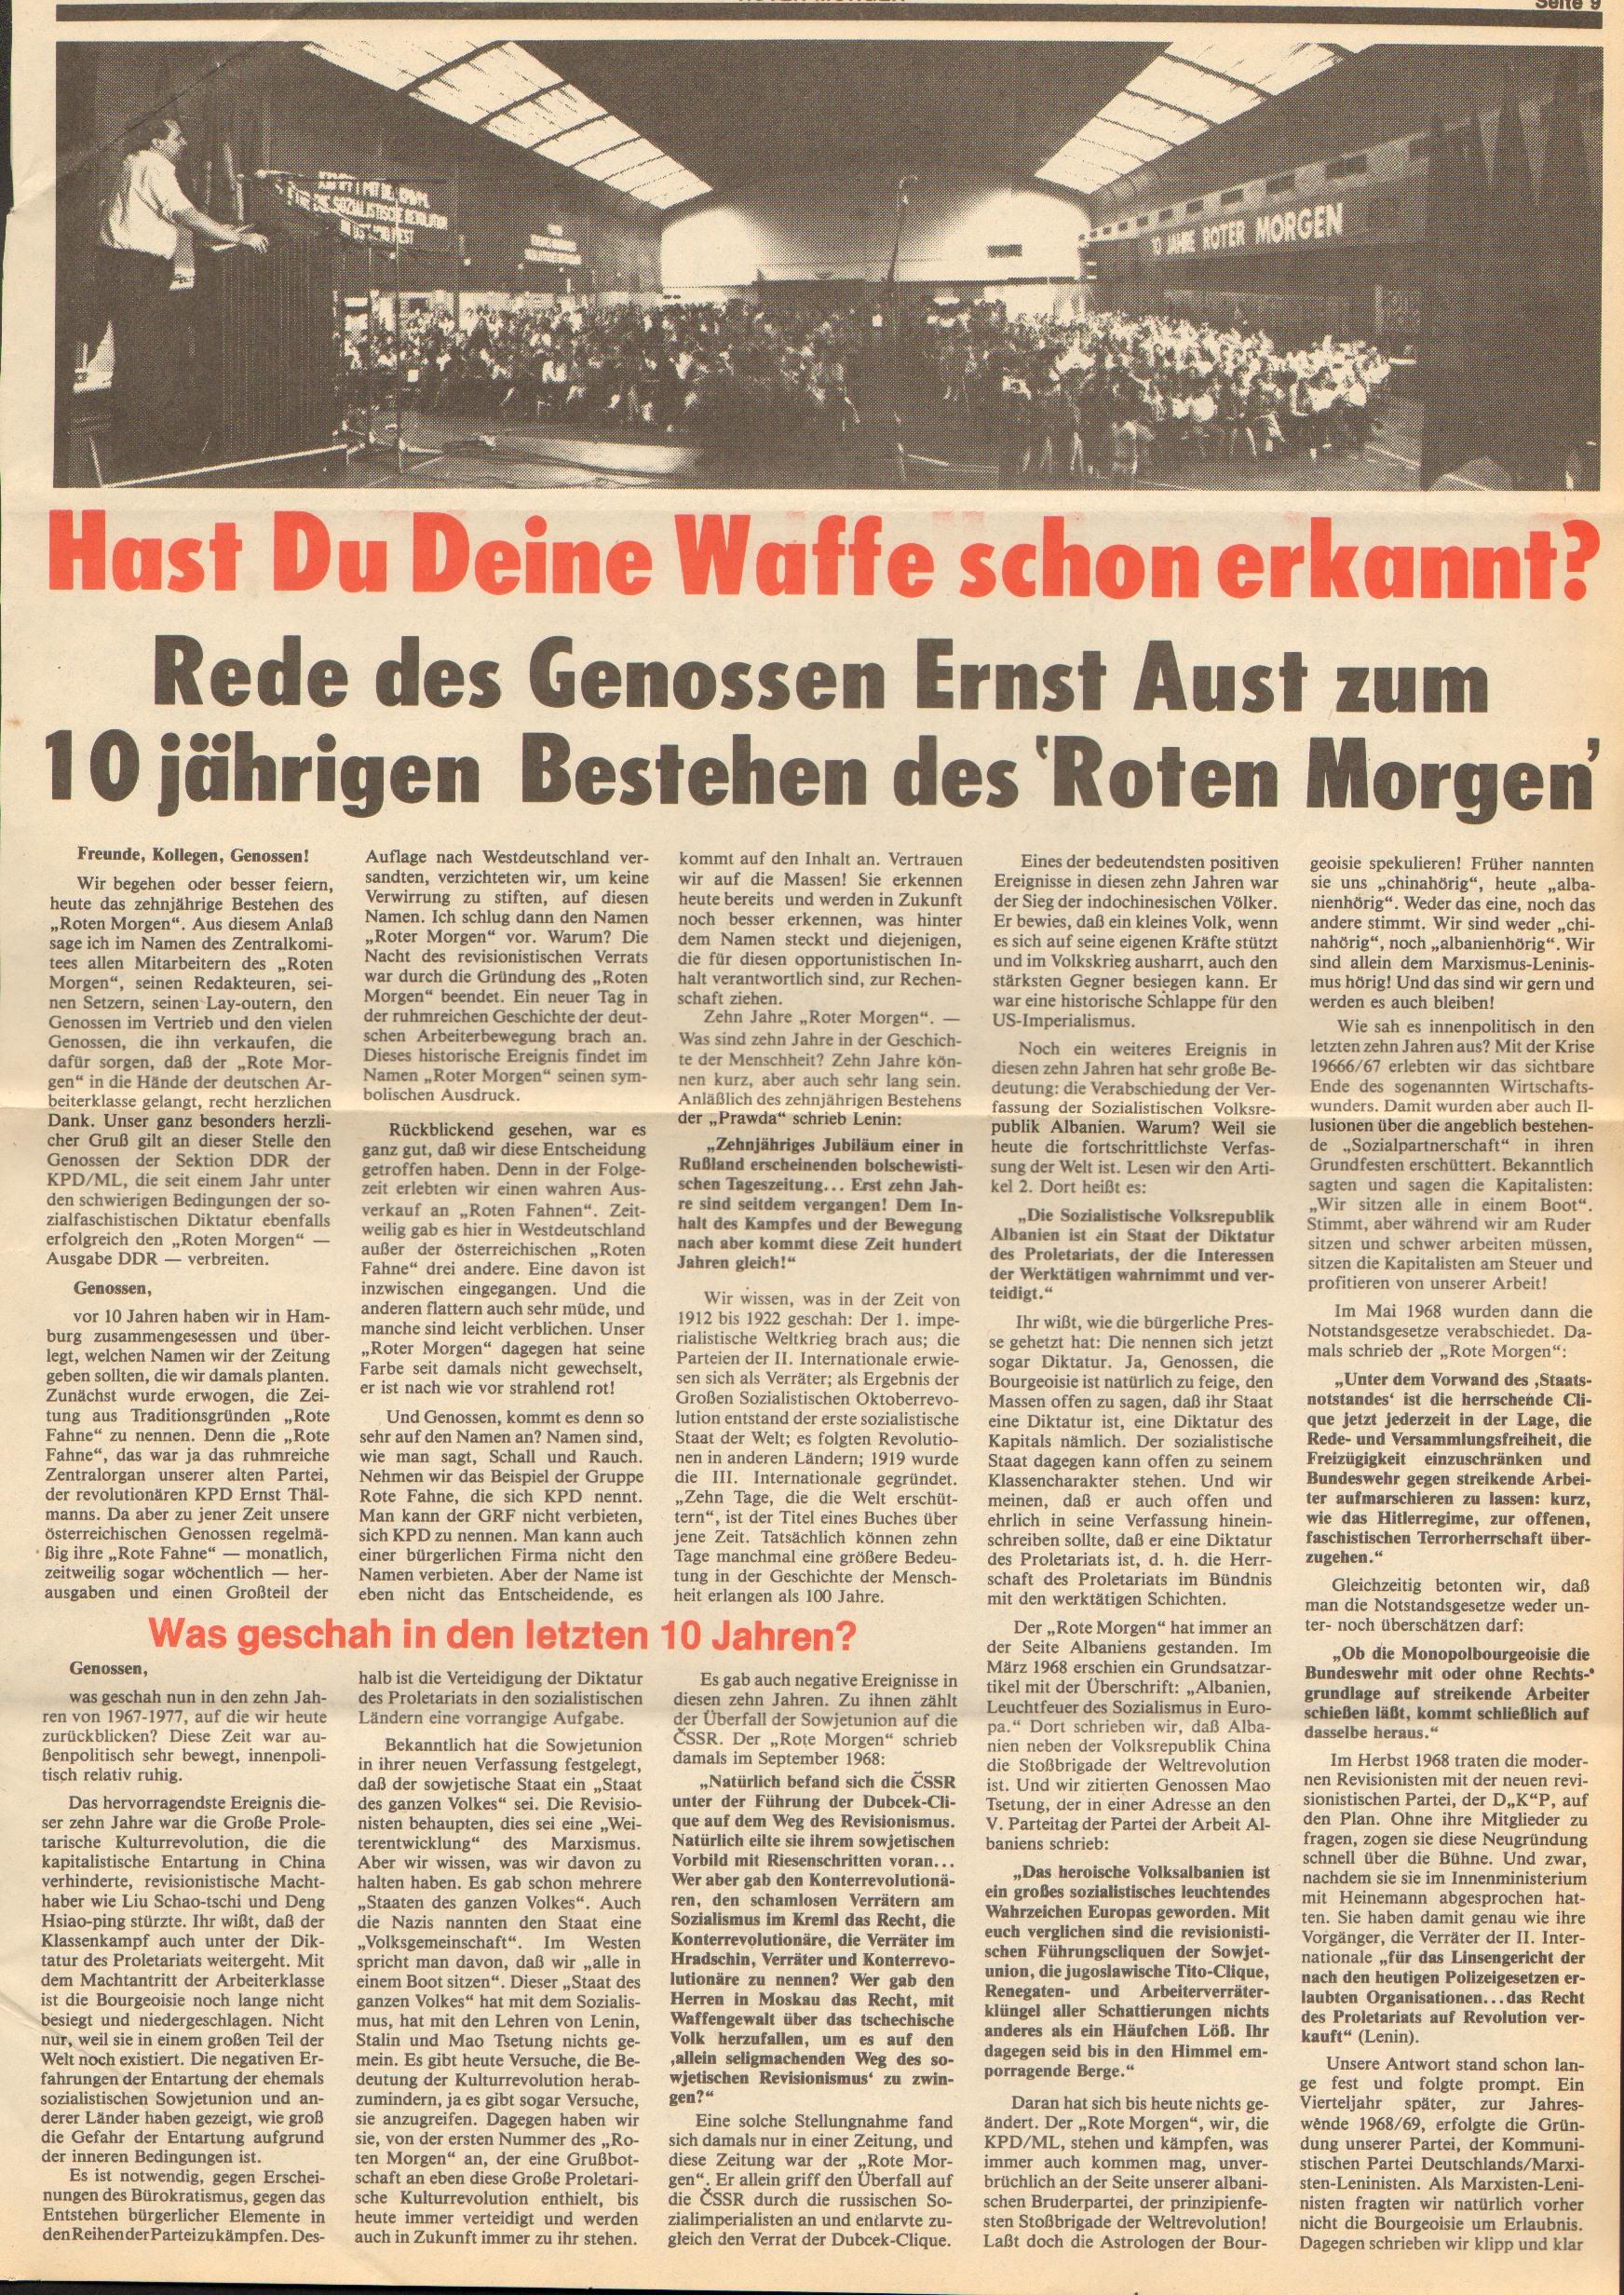 Roter Morgen, 11. Jg., 24. Juni 1977, Nr. 25, Seite 9